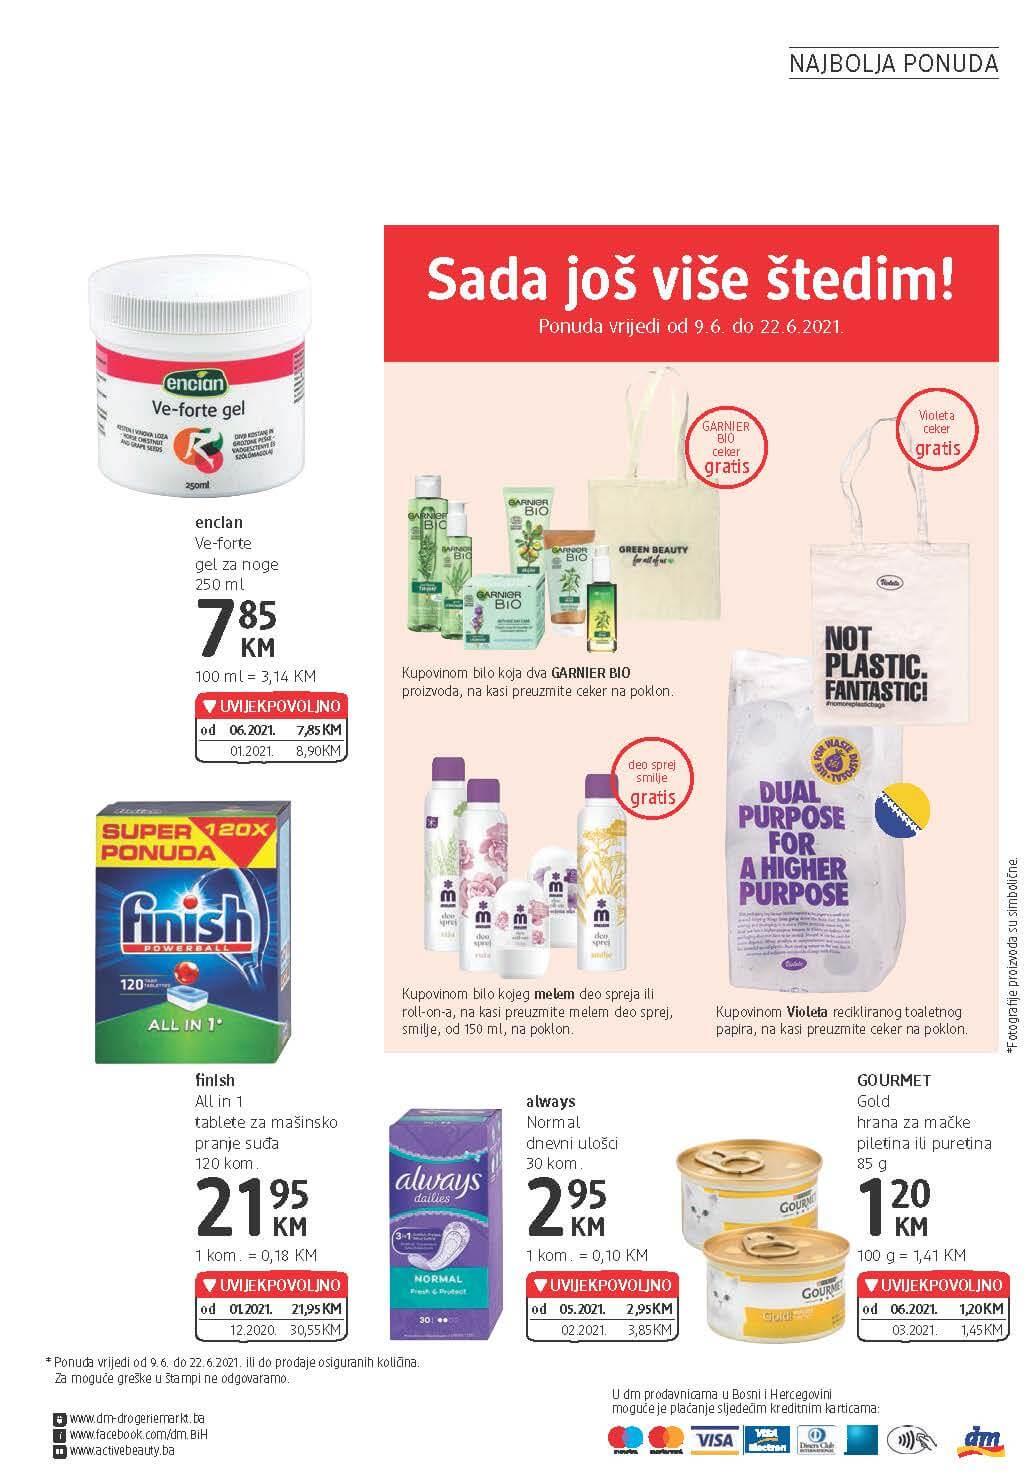 DM Katalog BiH JUN 2021 09.06. 22.06. eKatalozi.com PR Page 24